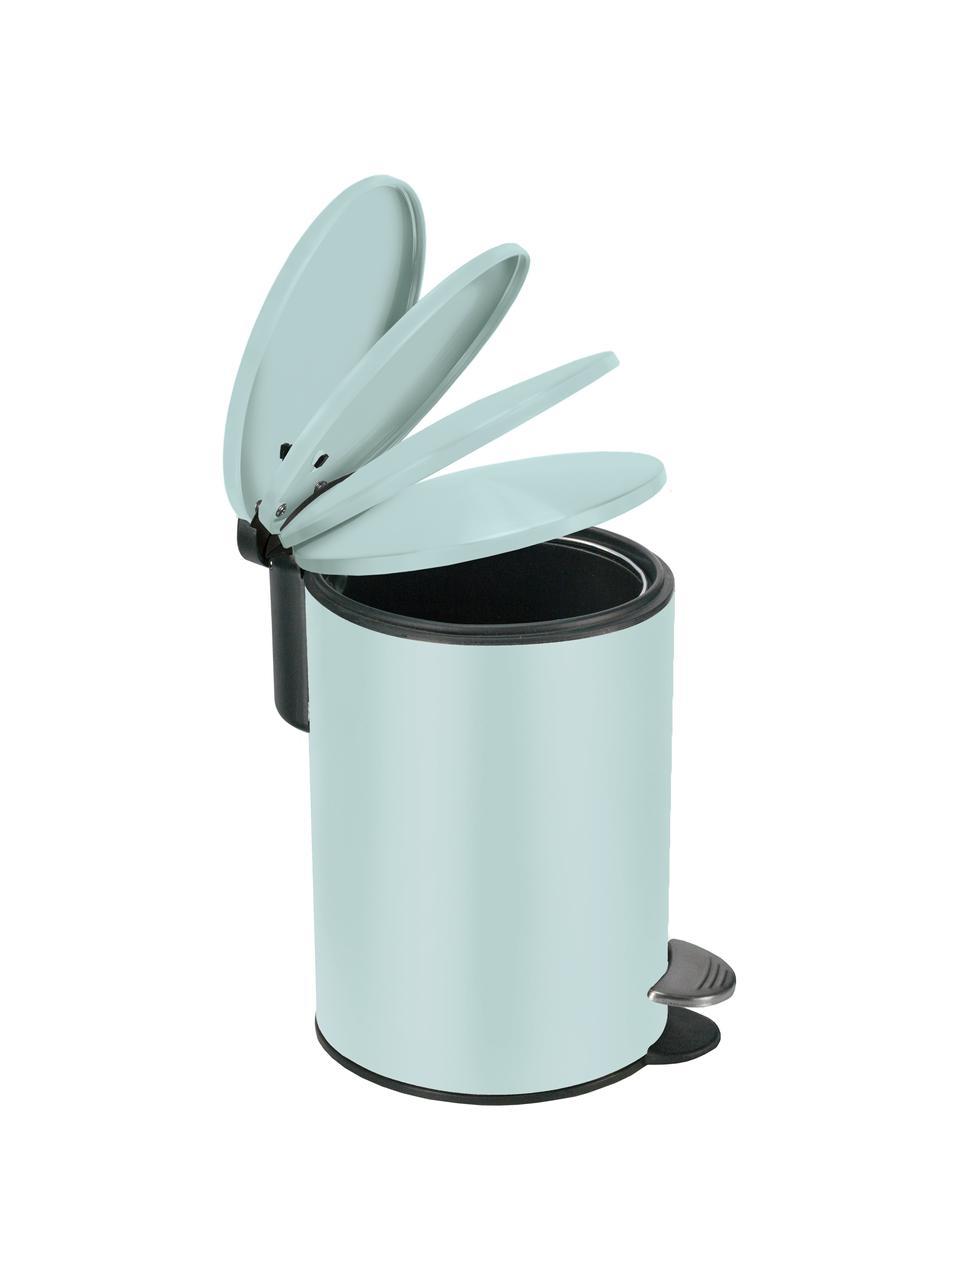 Abfalleimer Silence mit Pedalfunktion, Metall, lackiert, Hellblau, Ø 17 x H 24 cm